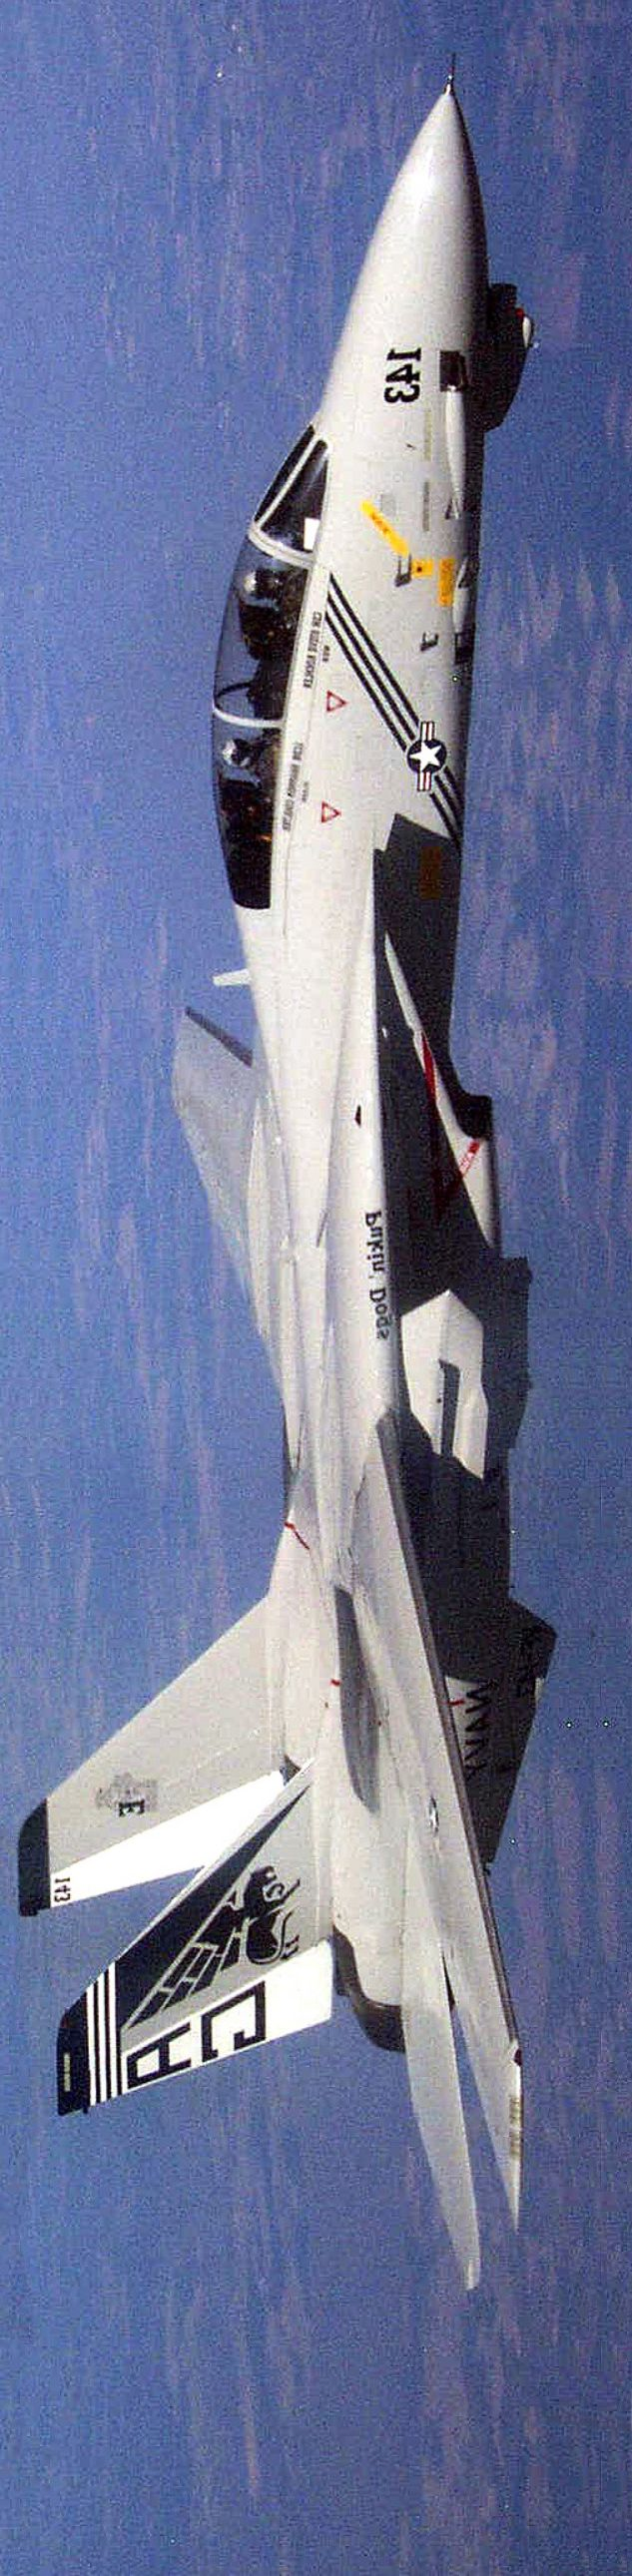 Amazing flying machine F-14 Tomcat